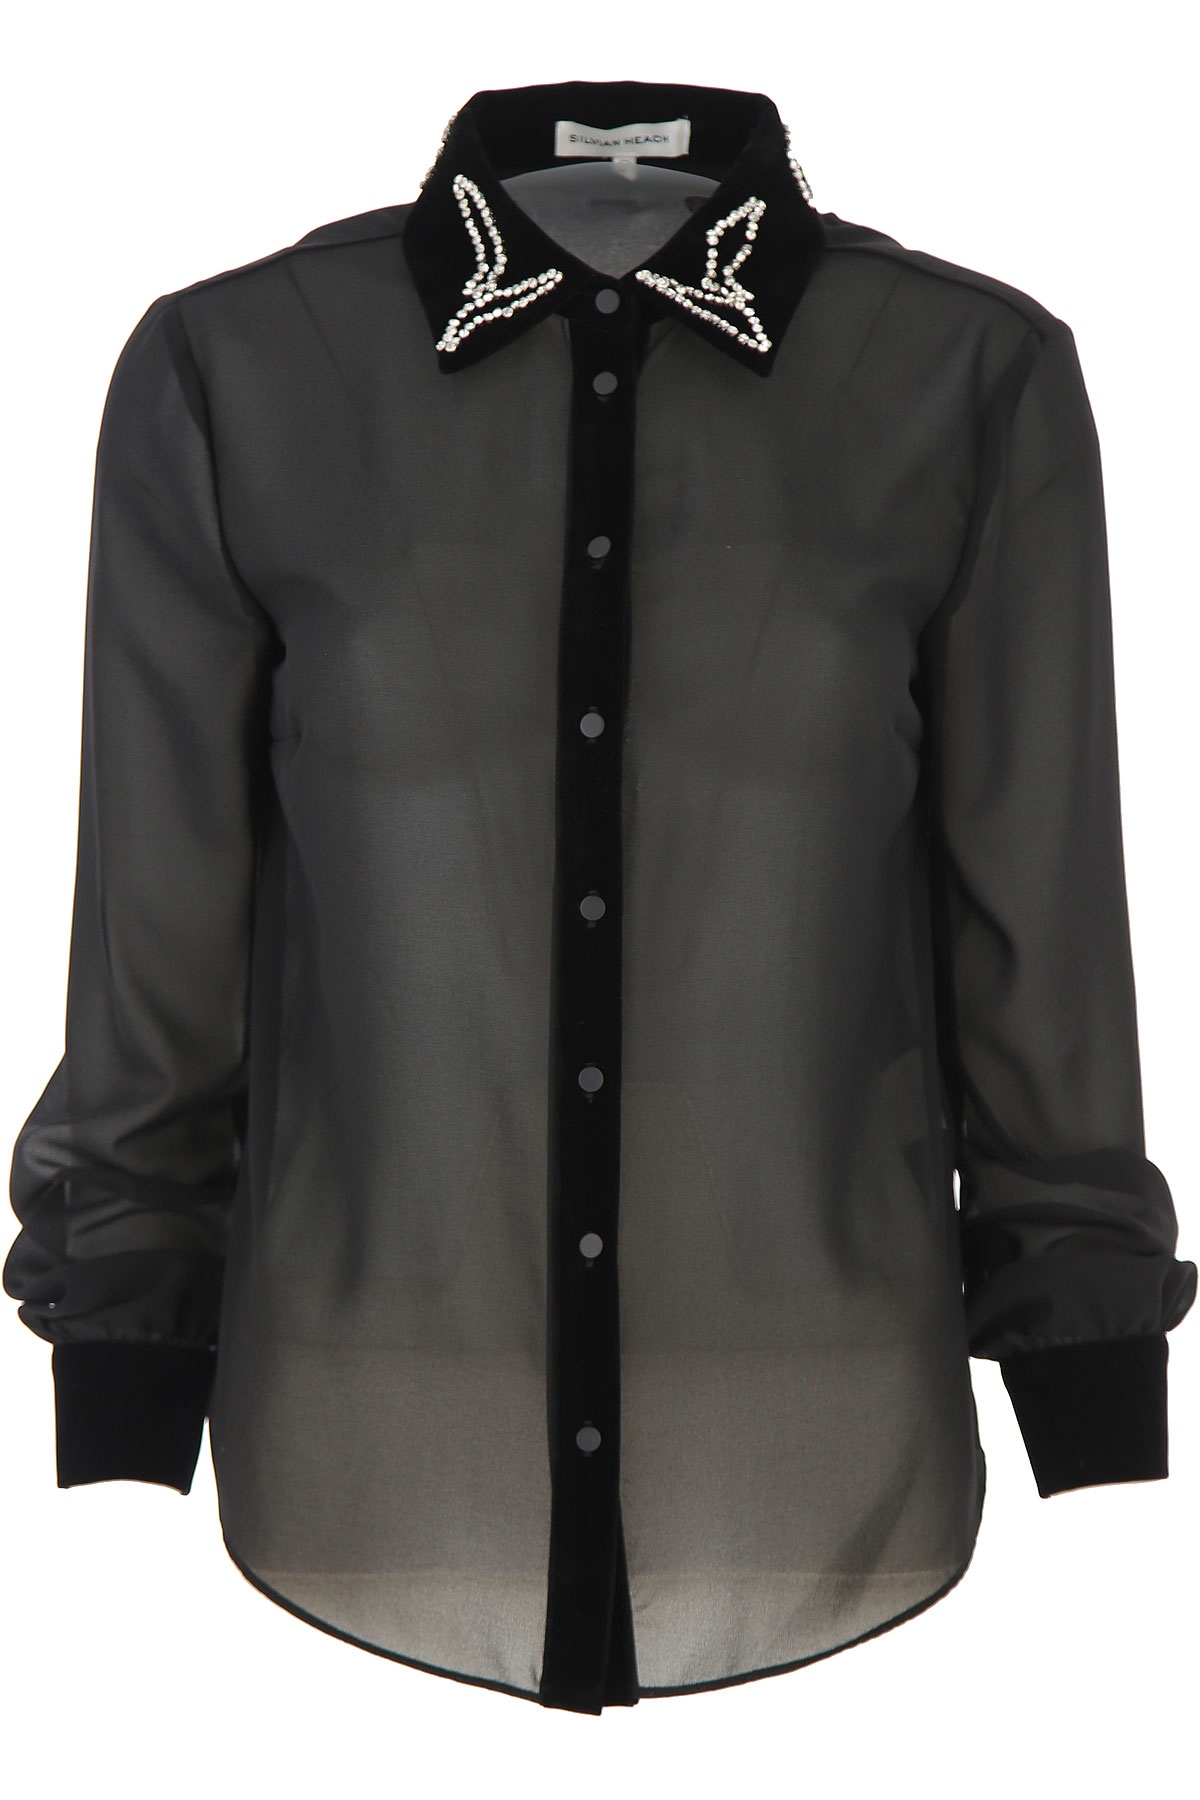 Silvian Heach Shirt for Women On Sale, Black, polyester, 2019, 2 4 6